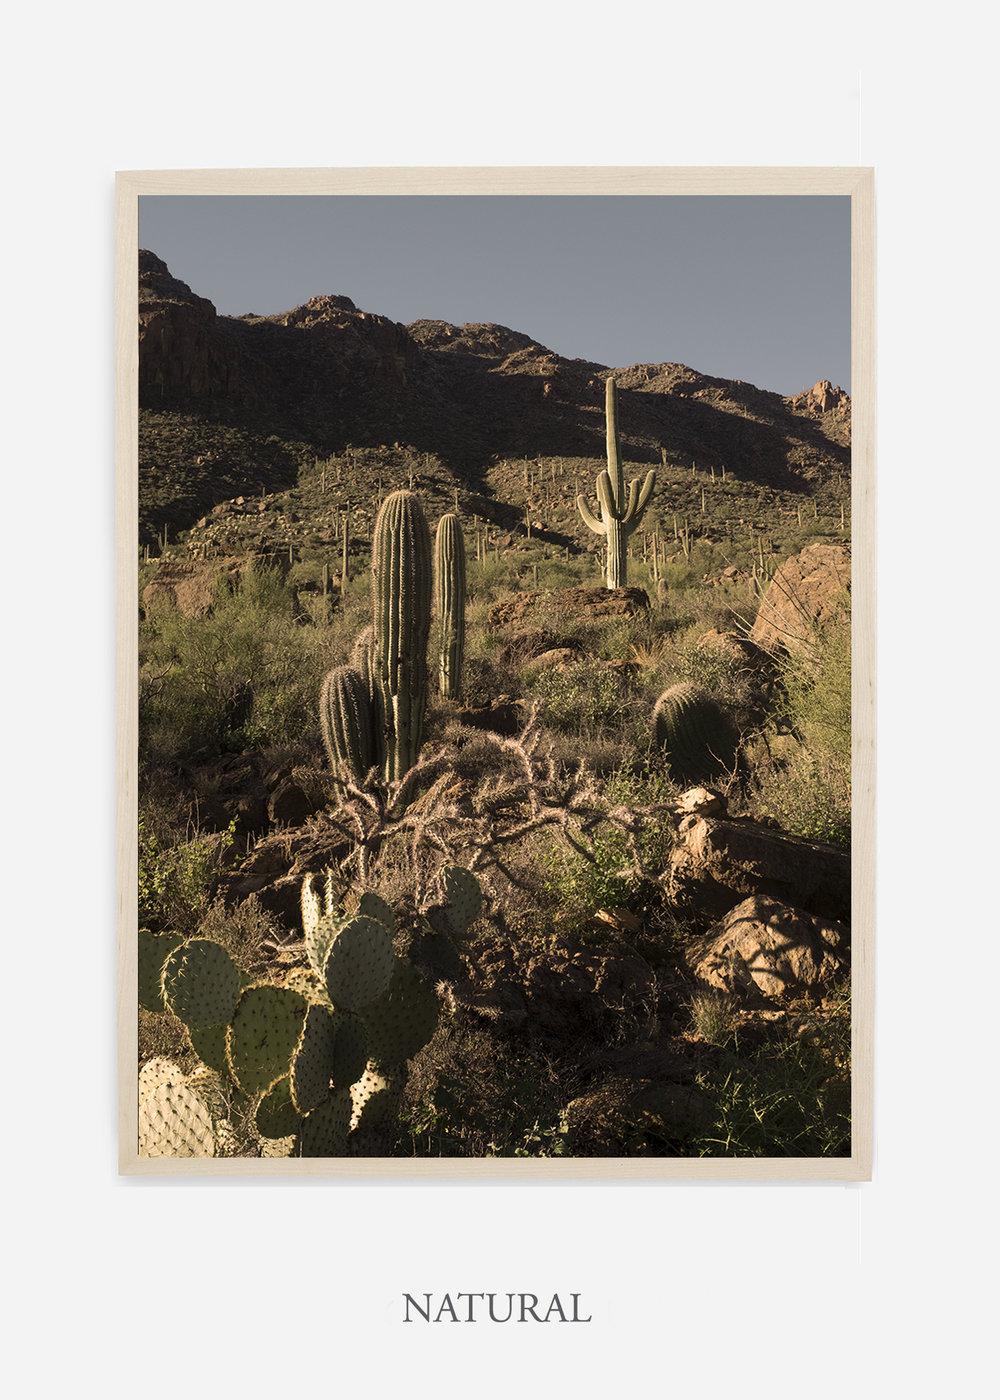 nomat-naturalframe-saguaroNo.18-wildercalifornia-art-wallart-cactusprint-homedecor-prints-arizona-botanical-artwork-interiordesign.jpg